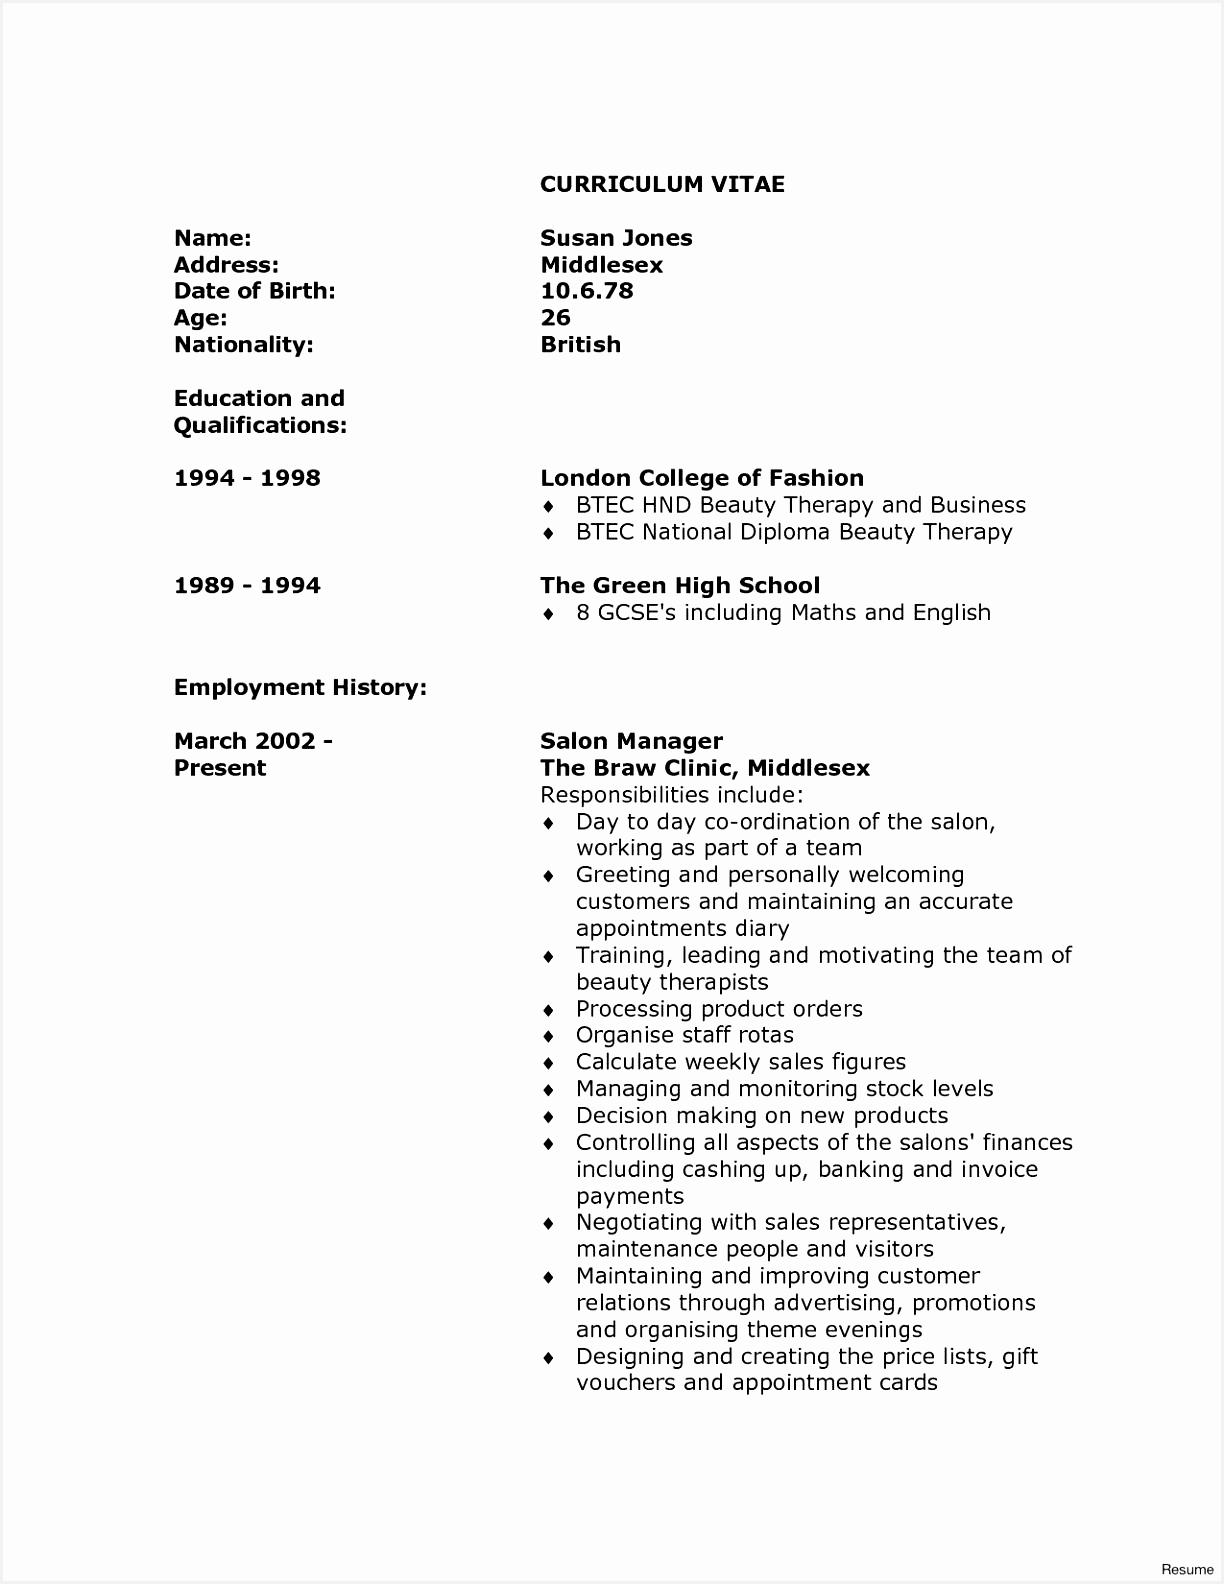 Fresh Elegant Europass Curriculum Vitae Template Resume Vs Curriculum Vitae 18 Awesome Resume Vs Curriculum15841224